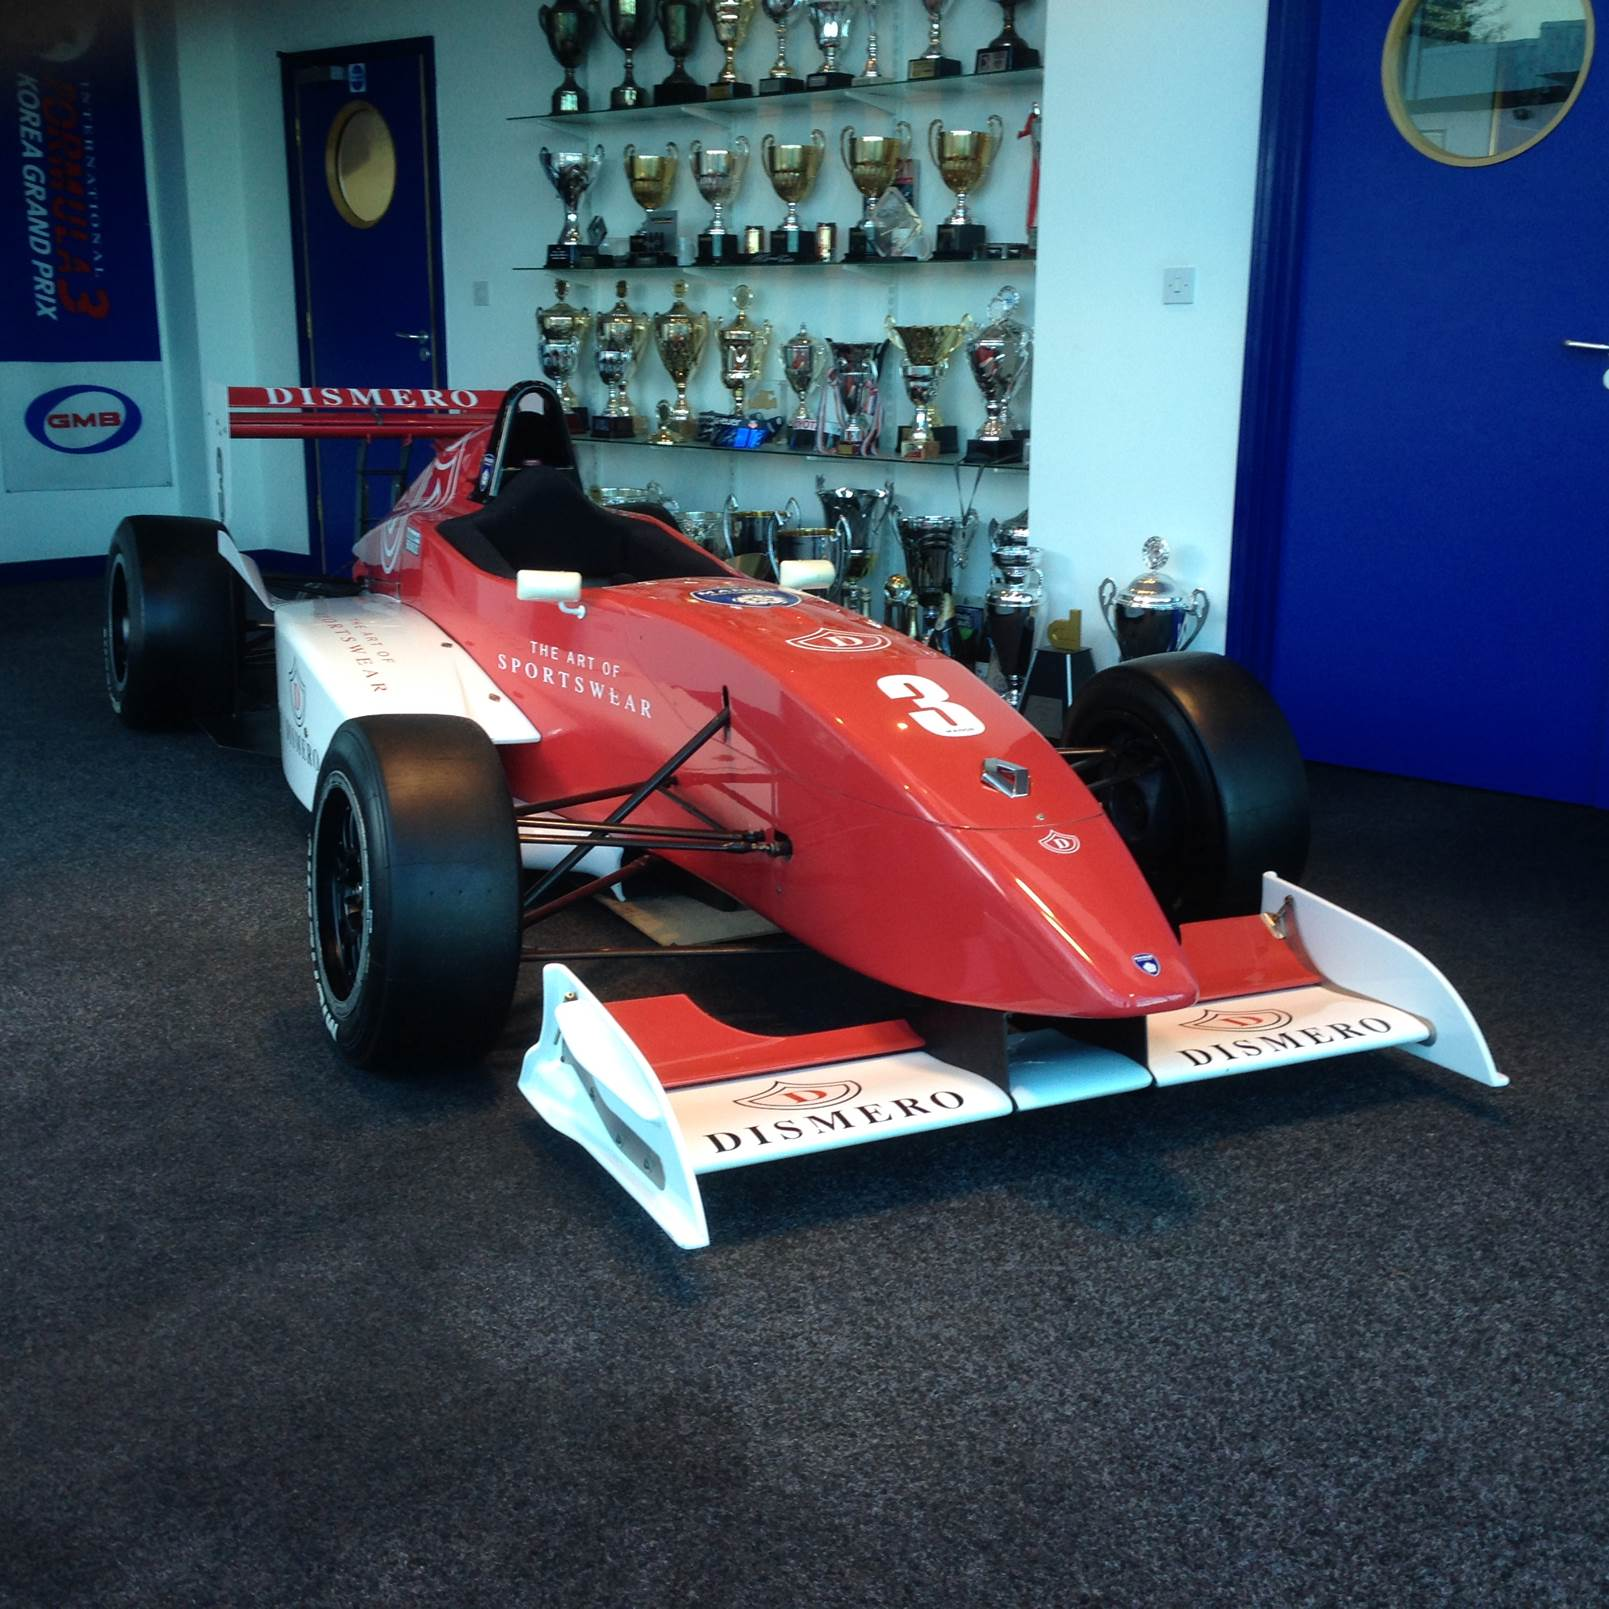 Caterham Sp 300r: Kimi Raikkonen Raced This Formula Renault In 2000, Now It